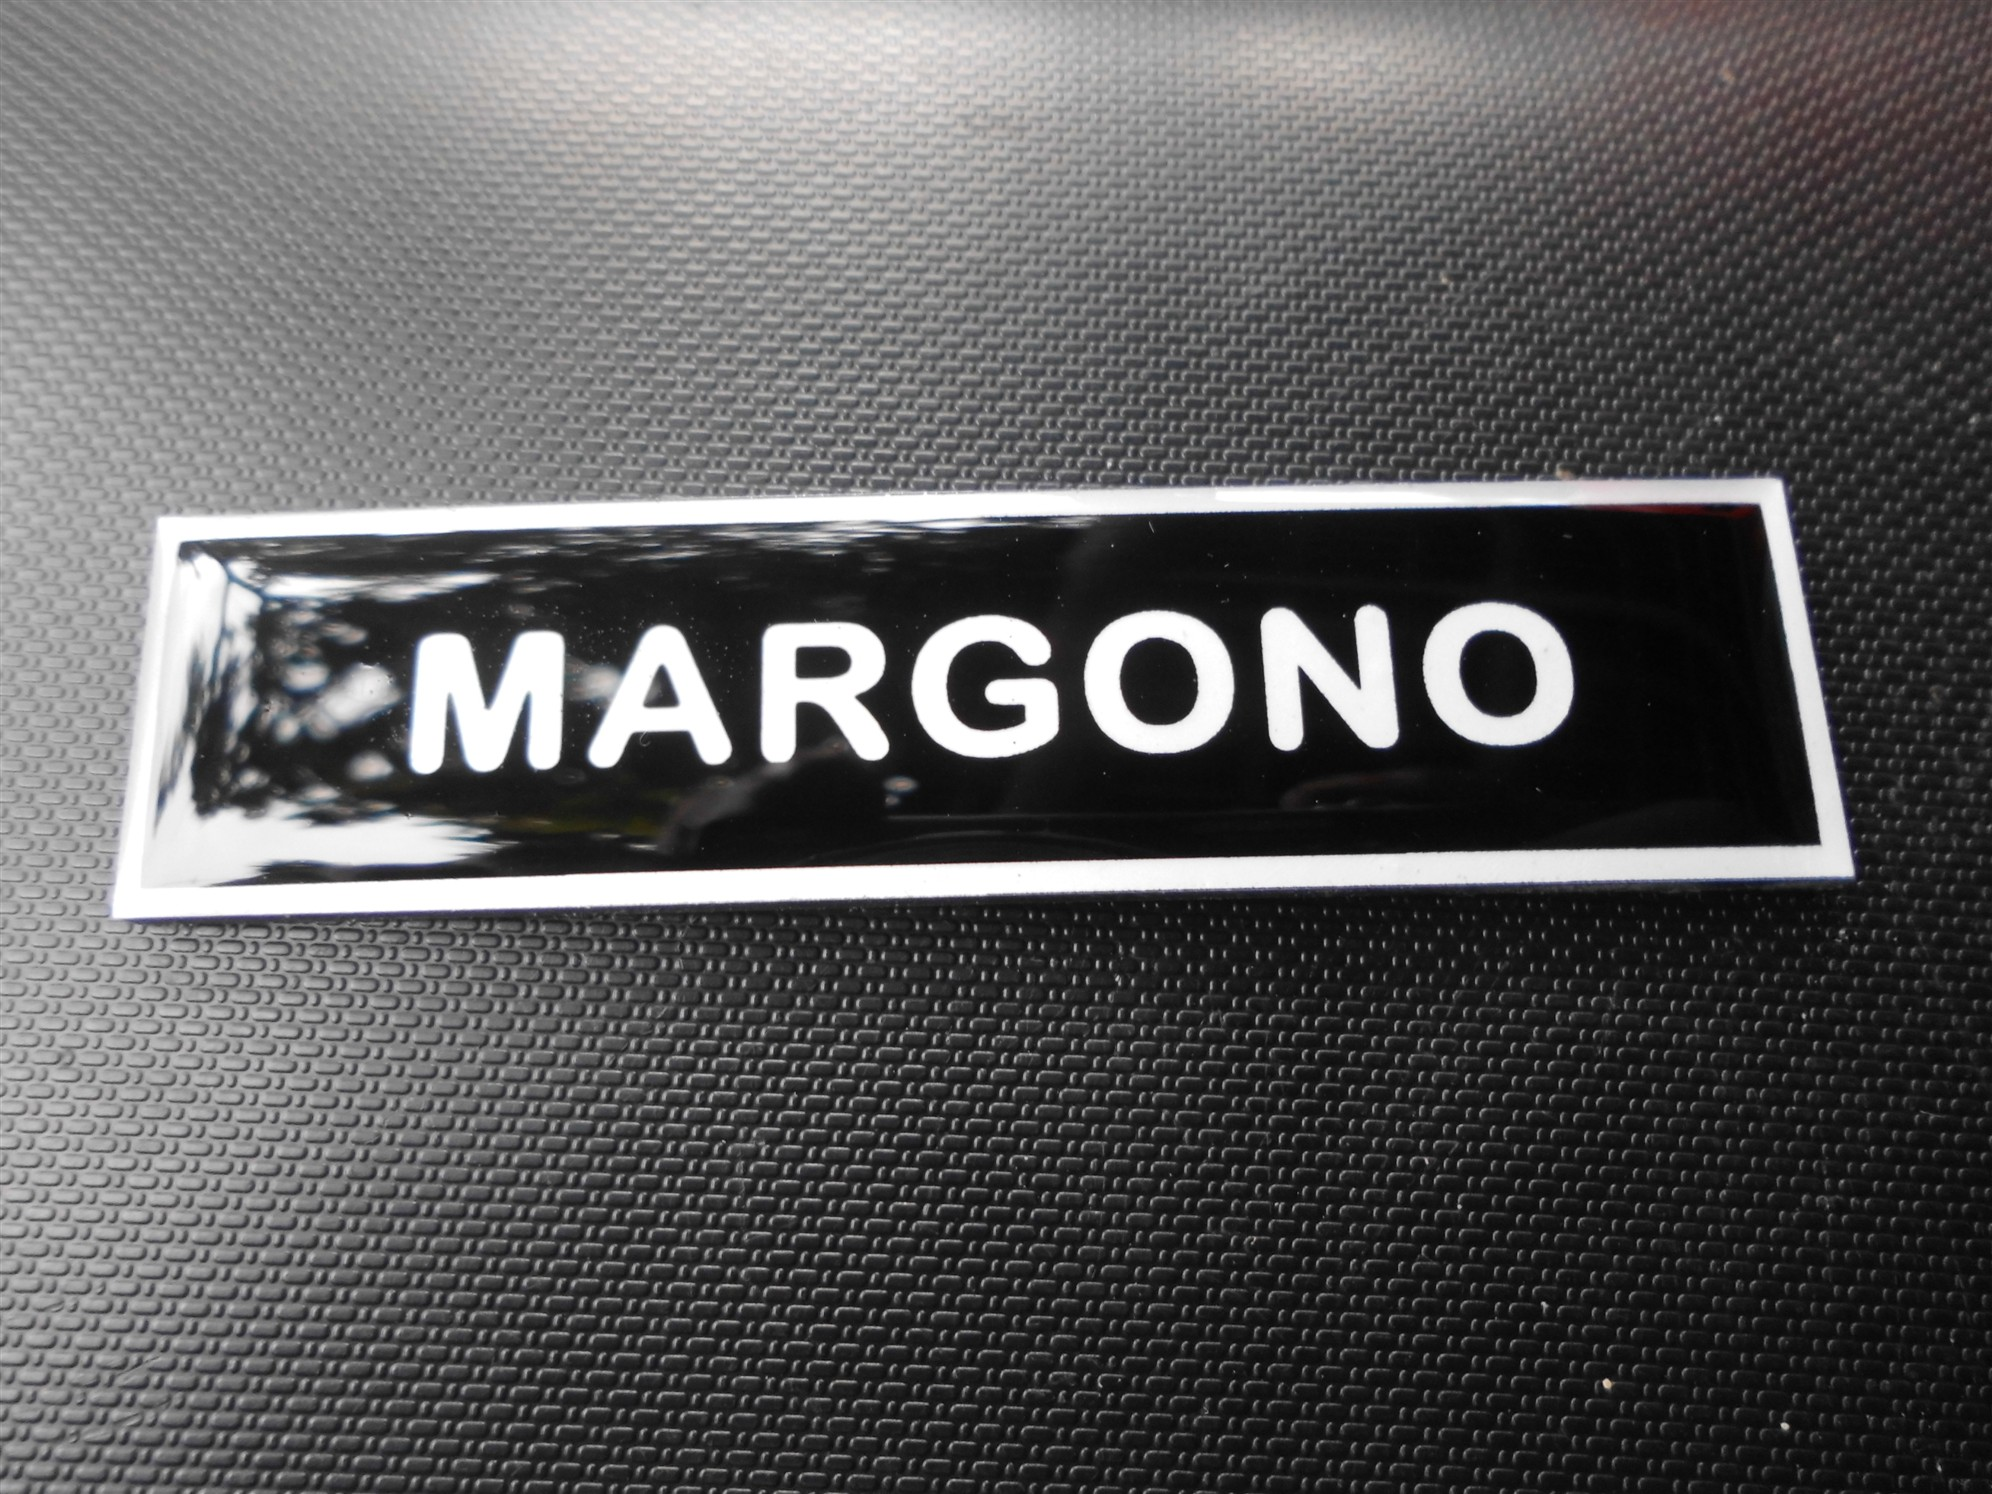 nama dada dasar hitam tulisan putih m a i pusat name tag papan